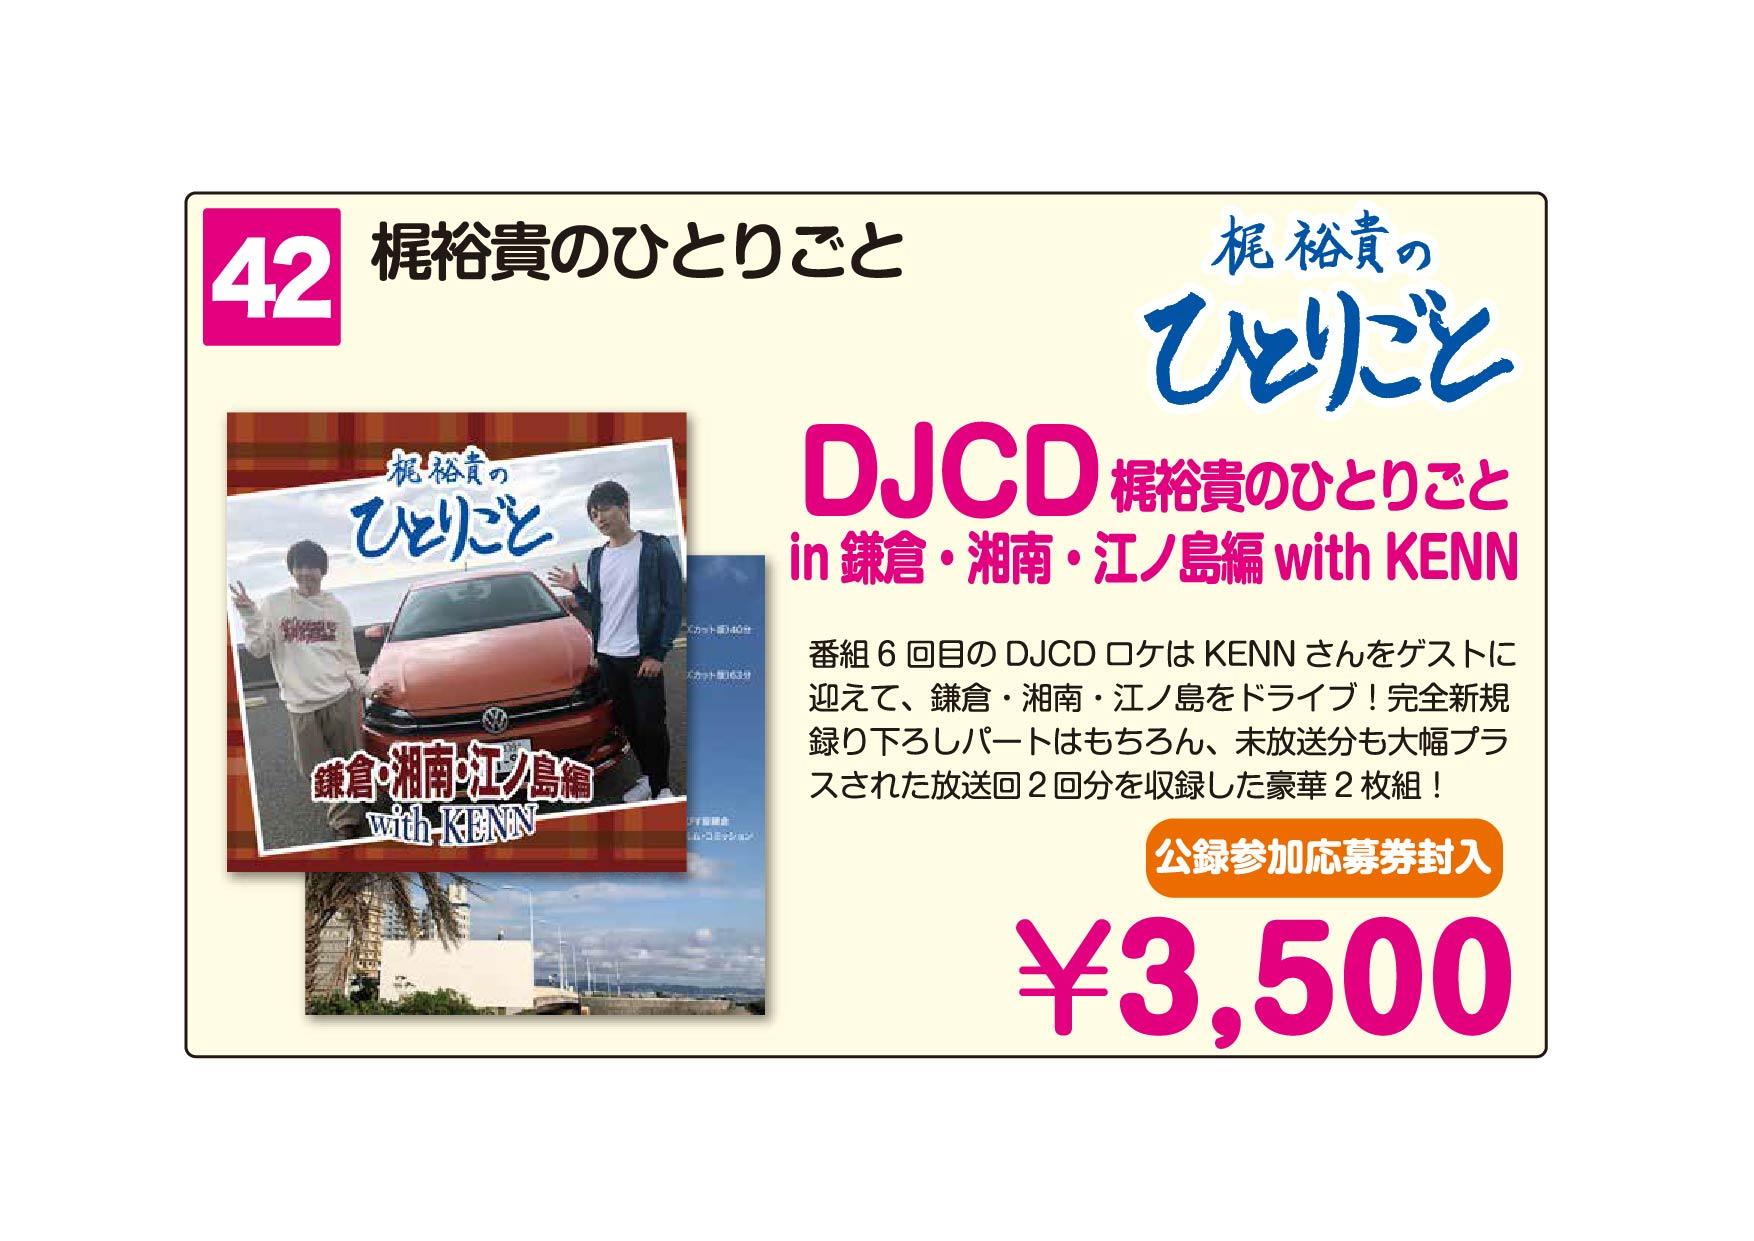 http://www.joqr.co.jp/AandG_booth/42.jpg